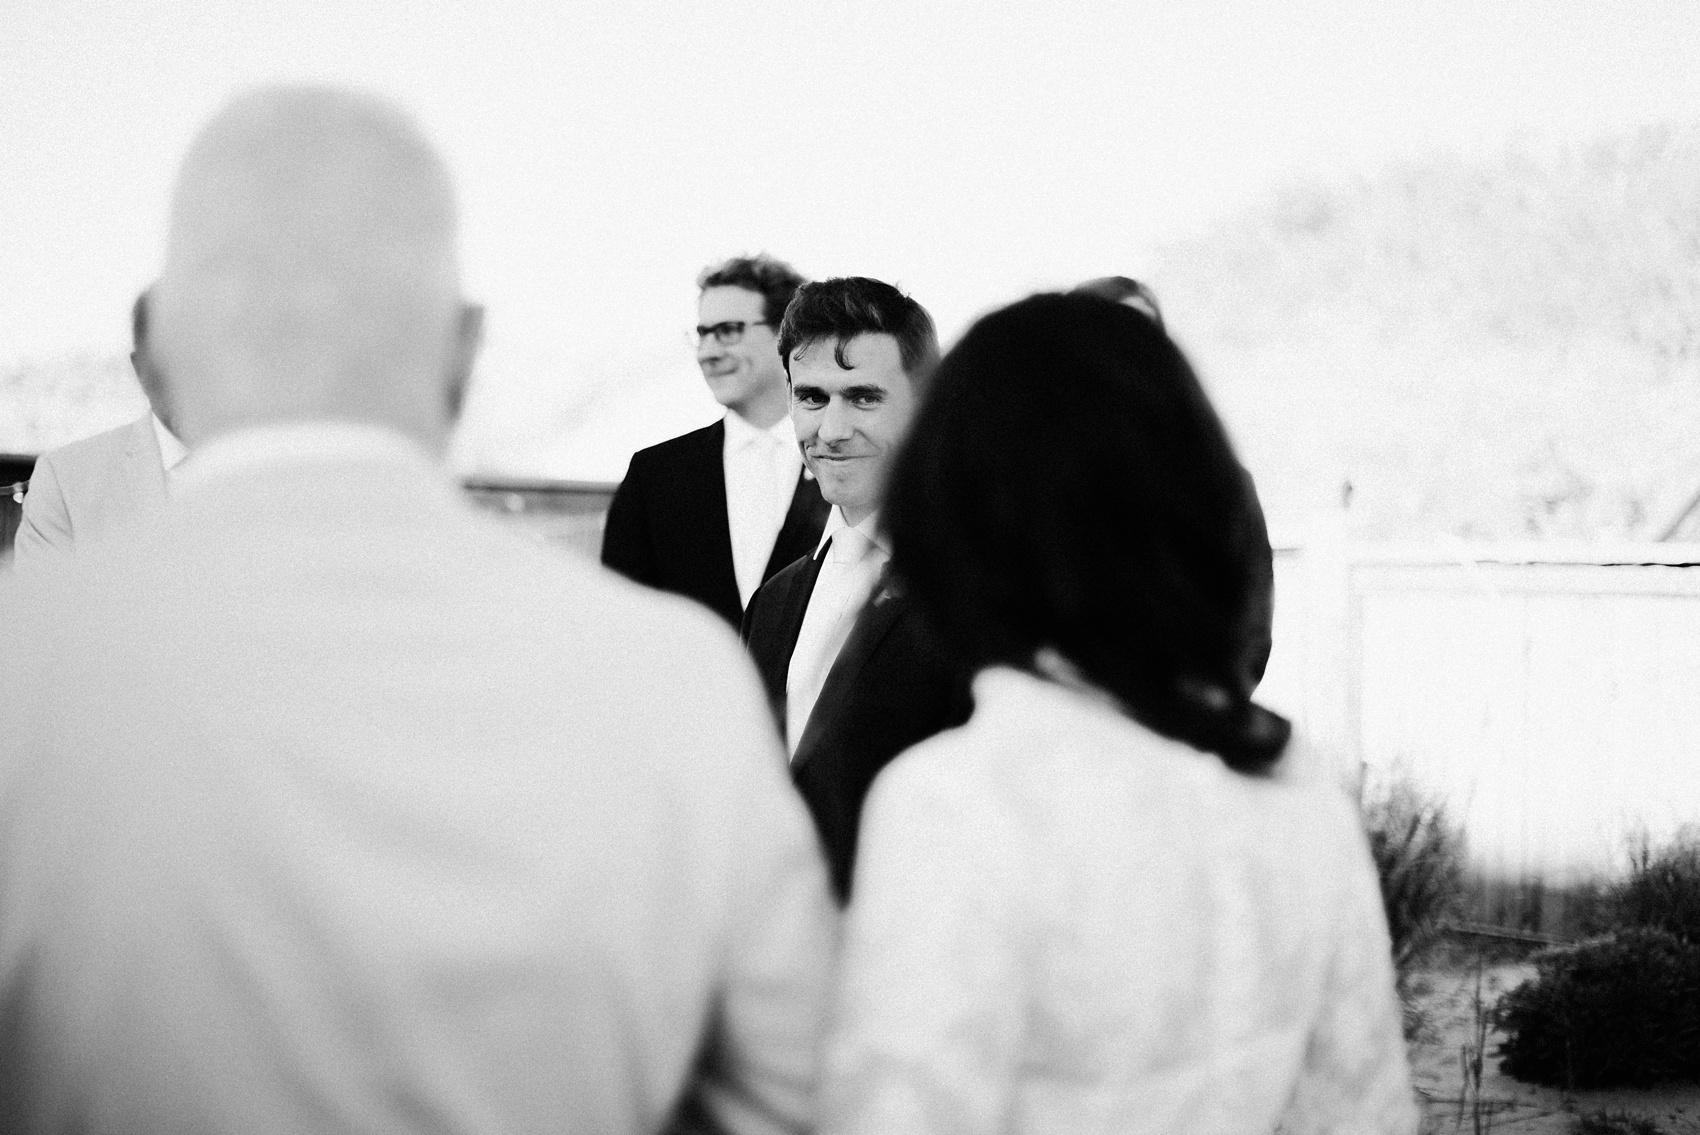 outerbanks_wedding_photographer_1276.jpg